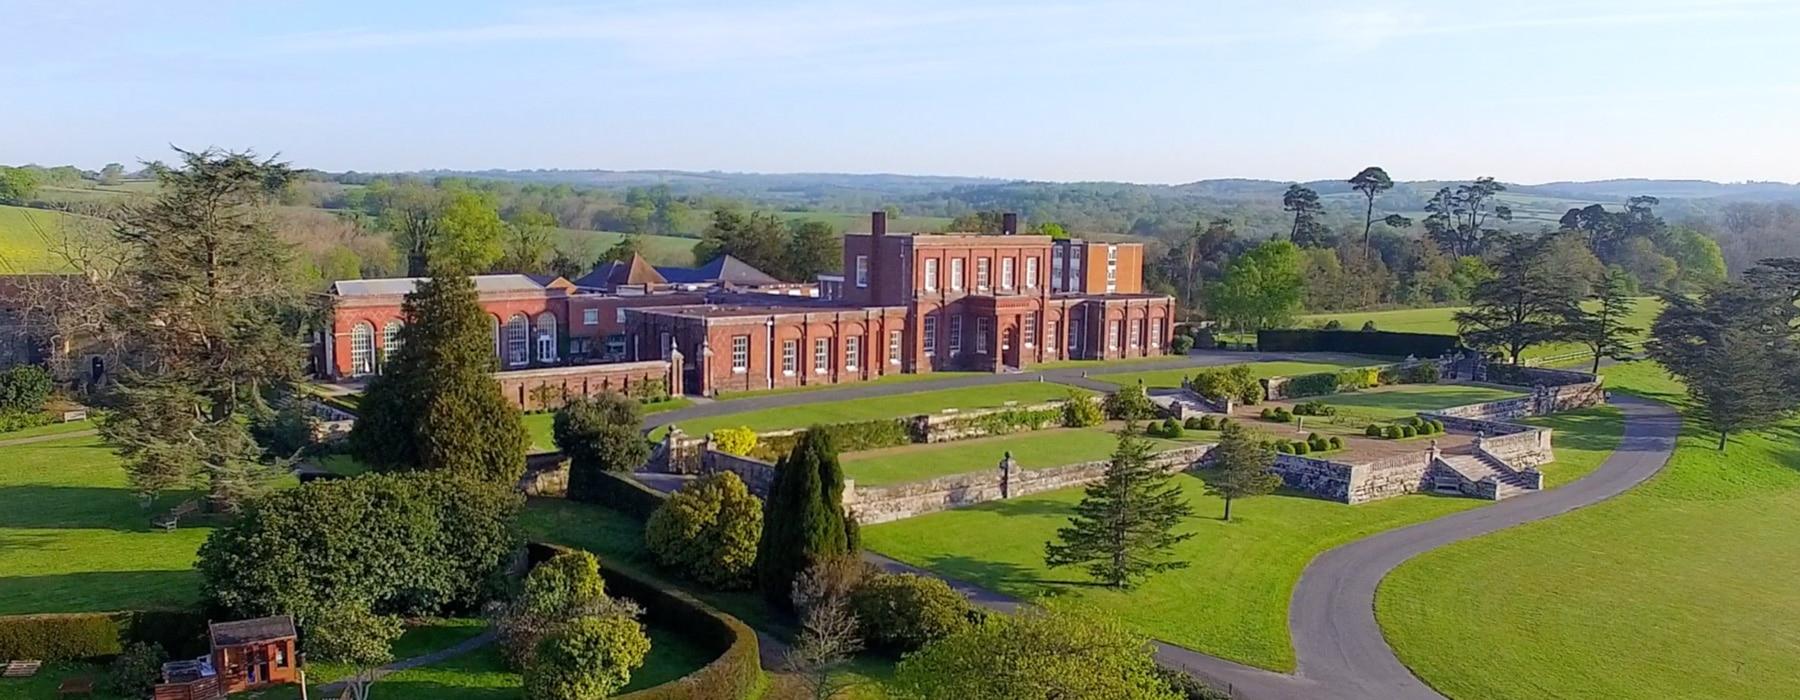 Christian Retreats in the UK